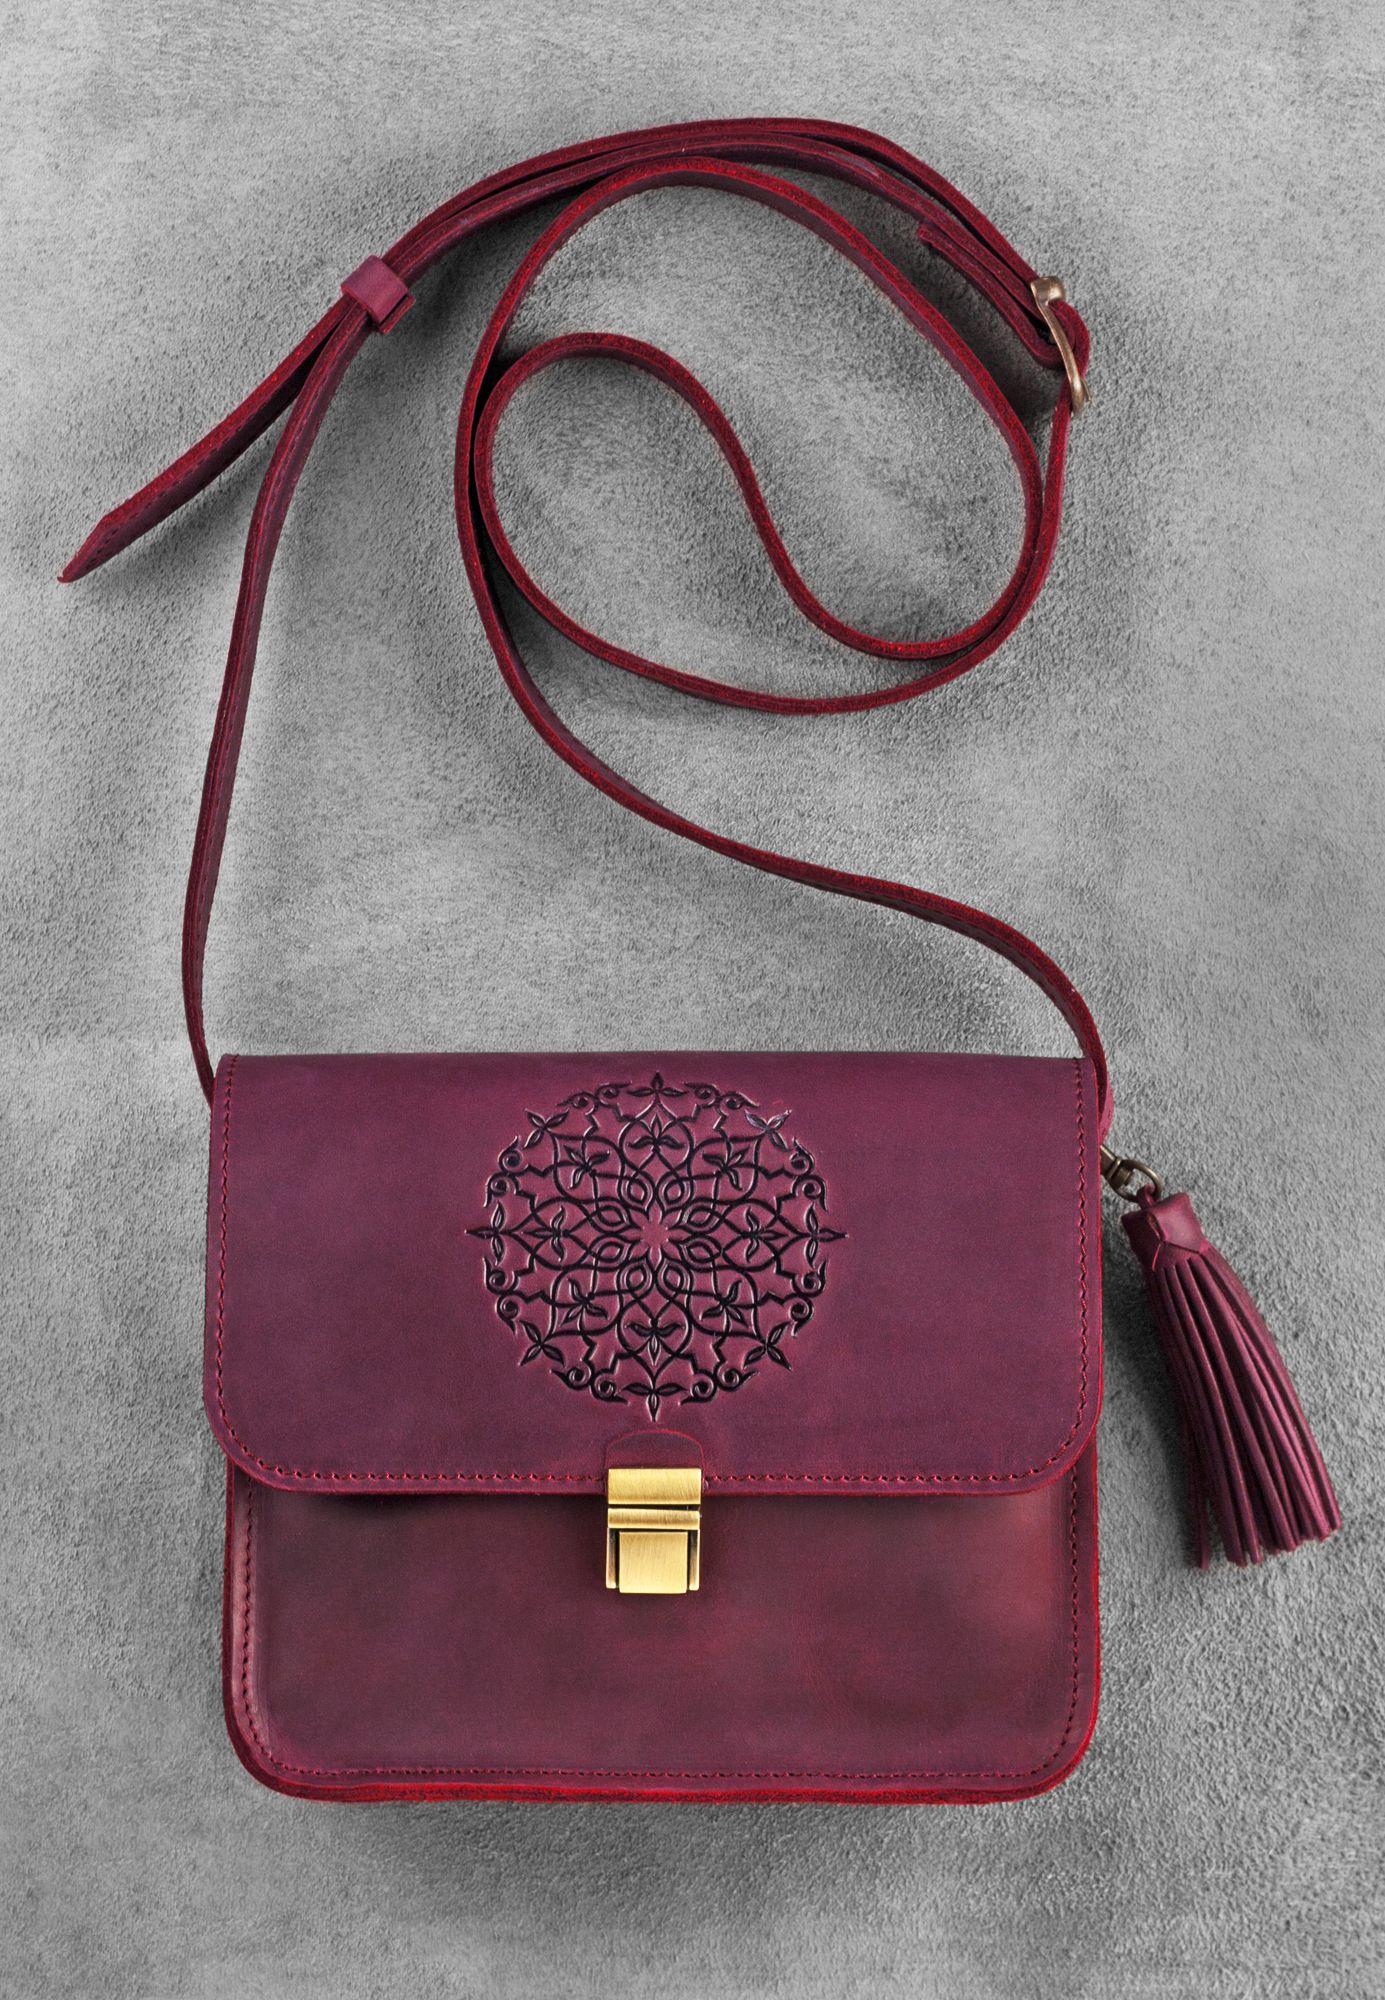 Кожаная сумка бохо Лилу Виноград Фото 8